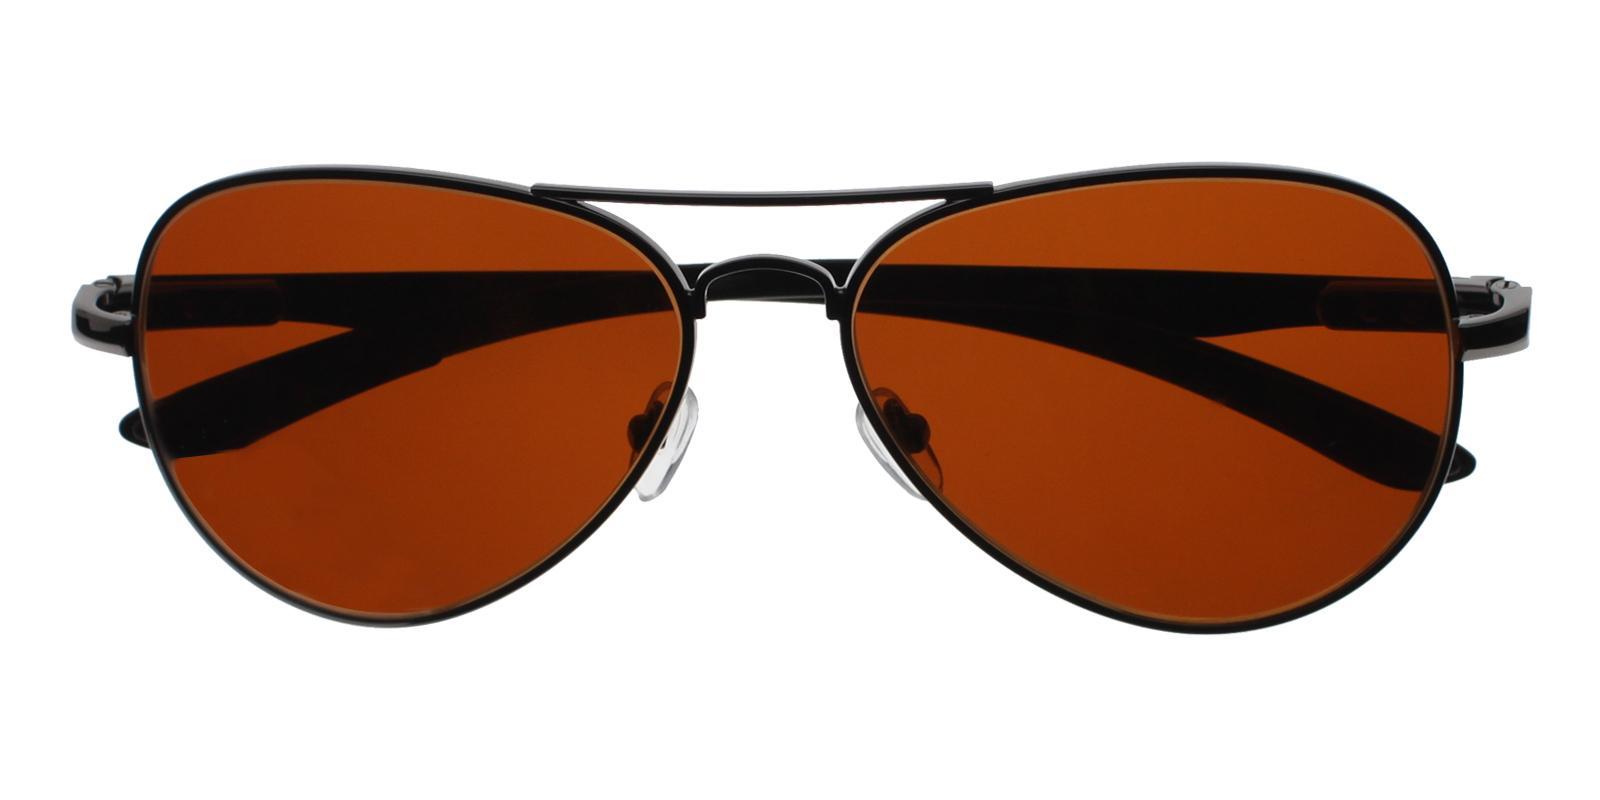 Logan Gun Metal NosePads , Sunglasses Frames from ABBE Glasses